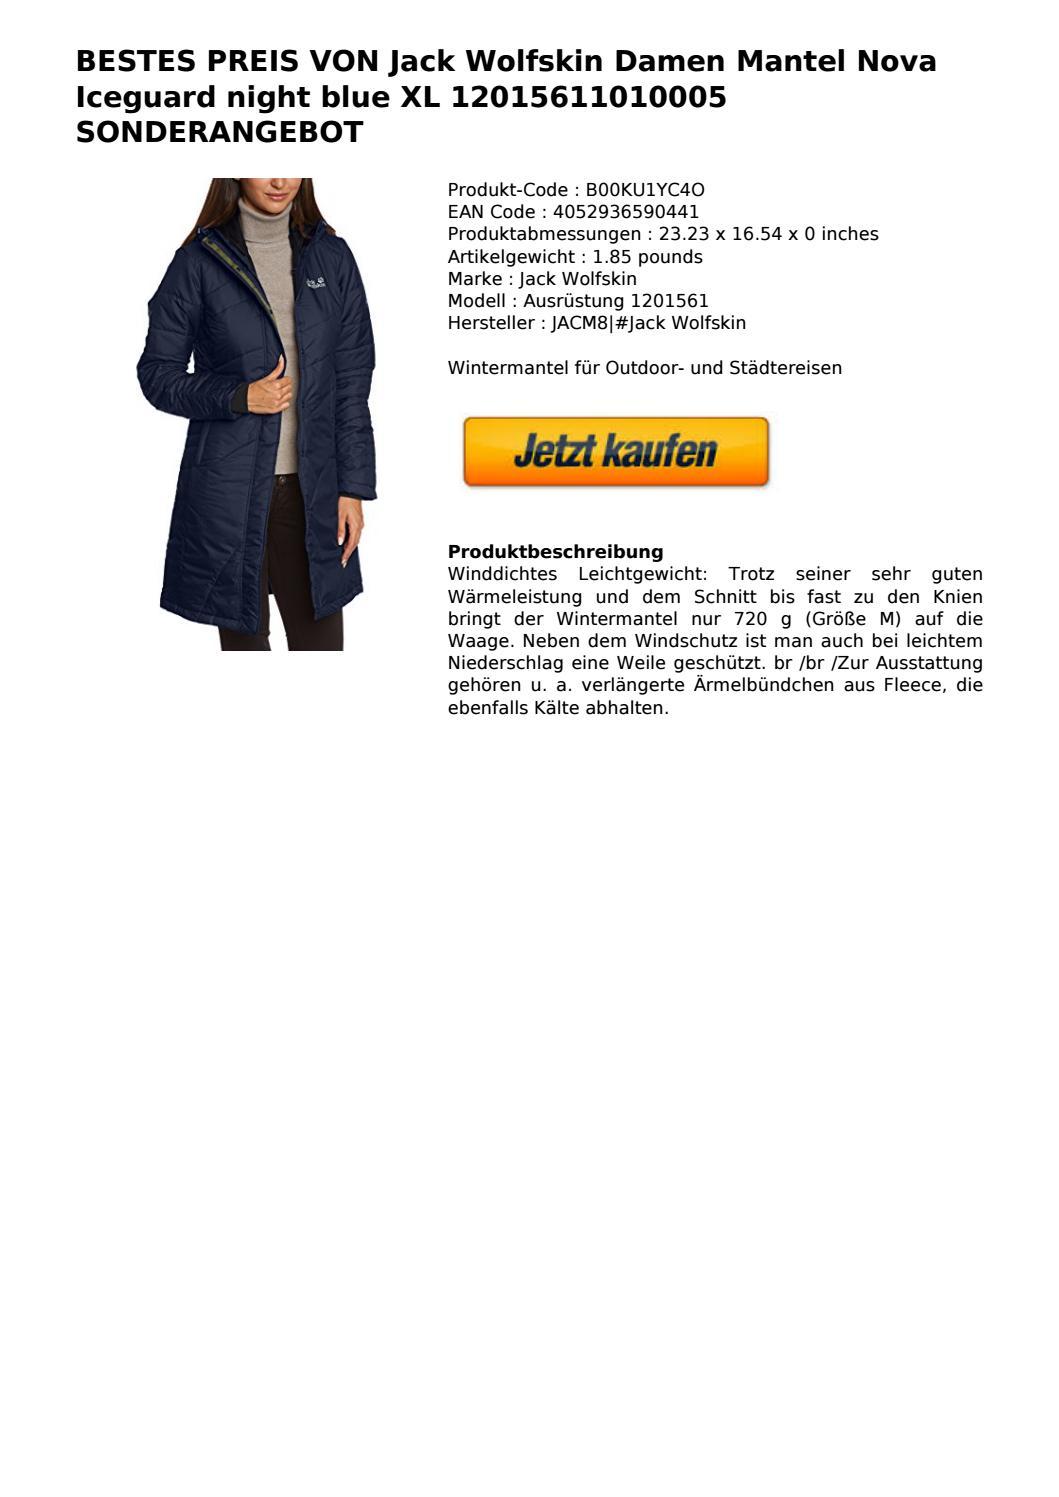 Bestes Wolfskin Damen Nova Iceguard Jack Preis Von Mantel UVzqSMp